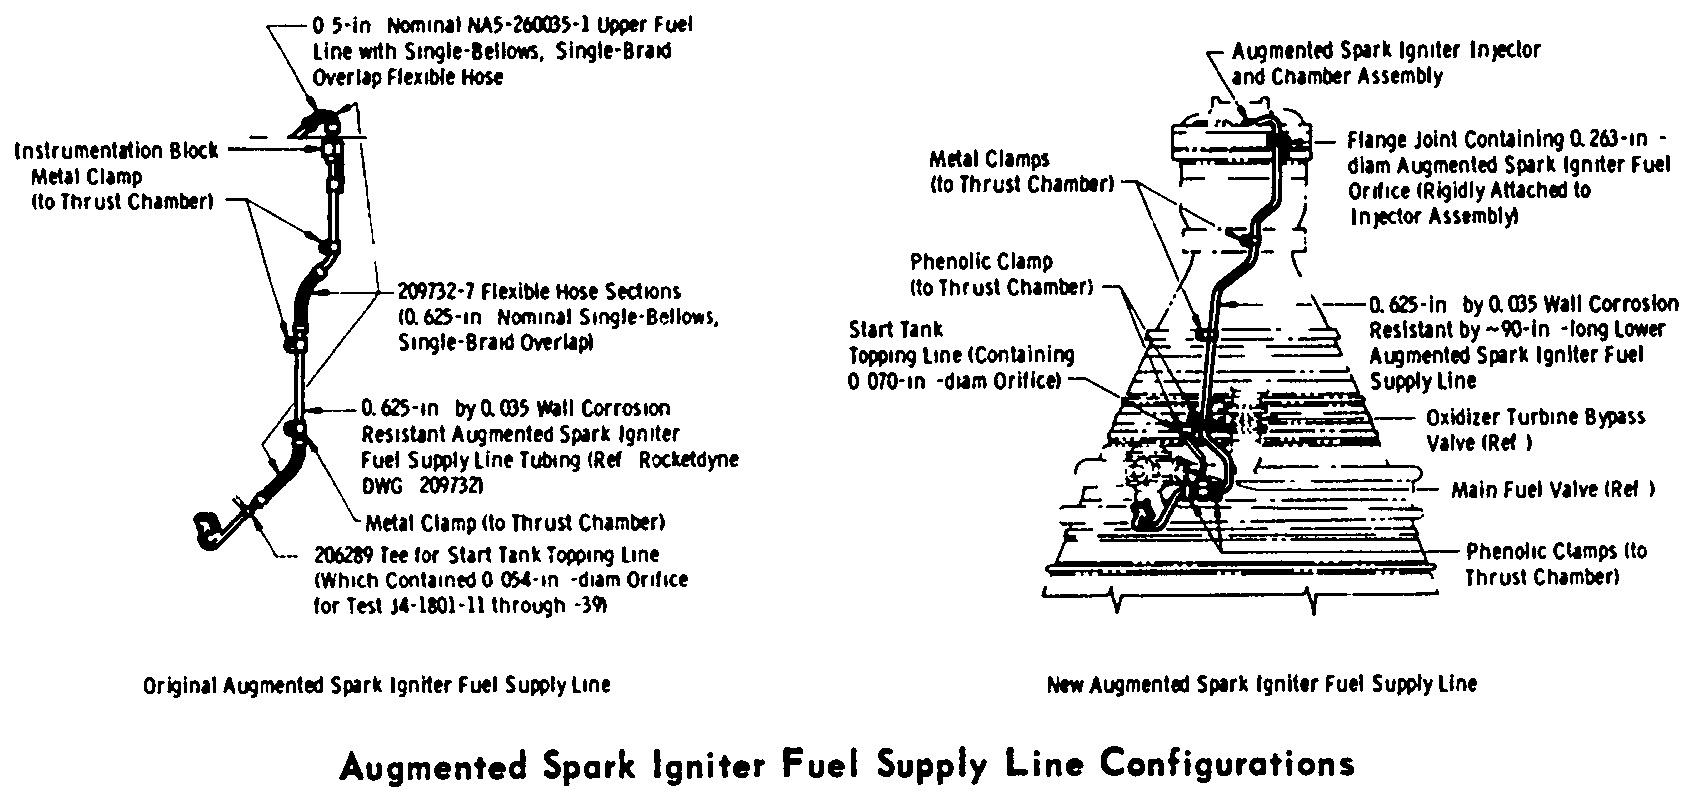 J-2 rocket engine augmented spark igniter ASI